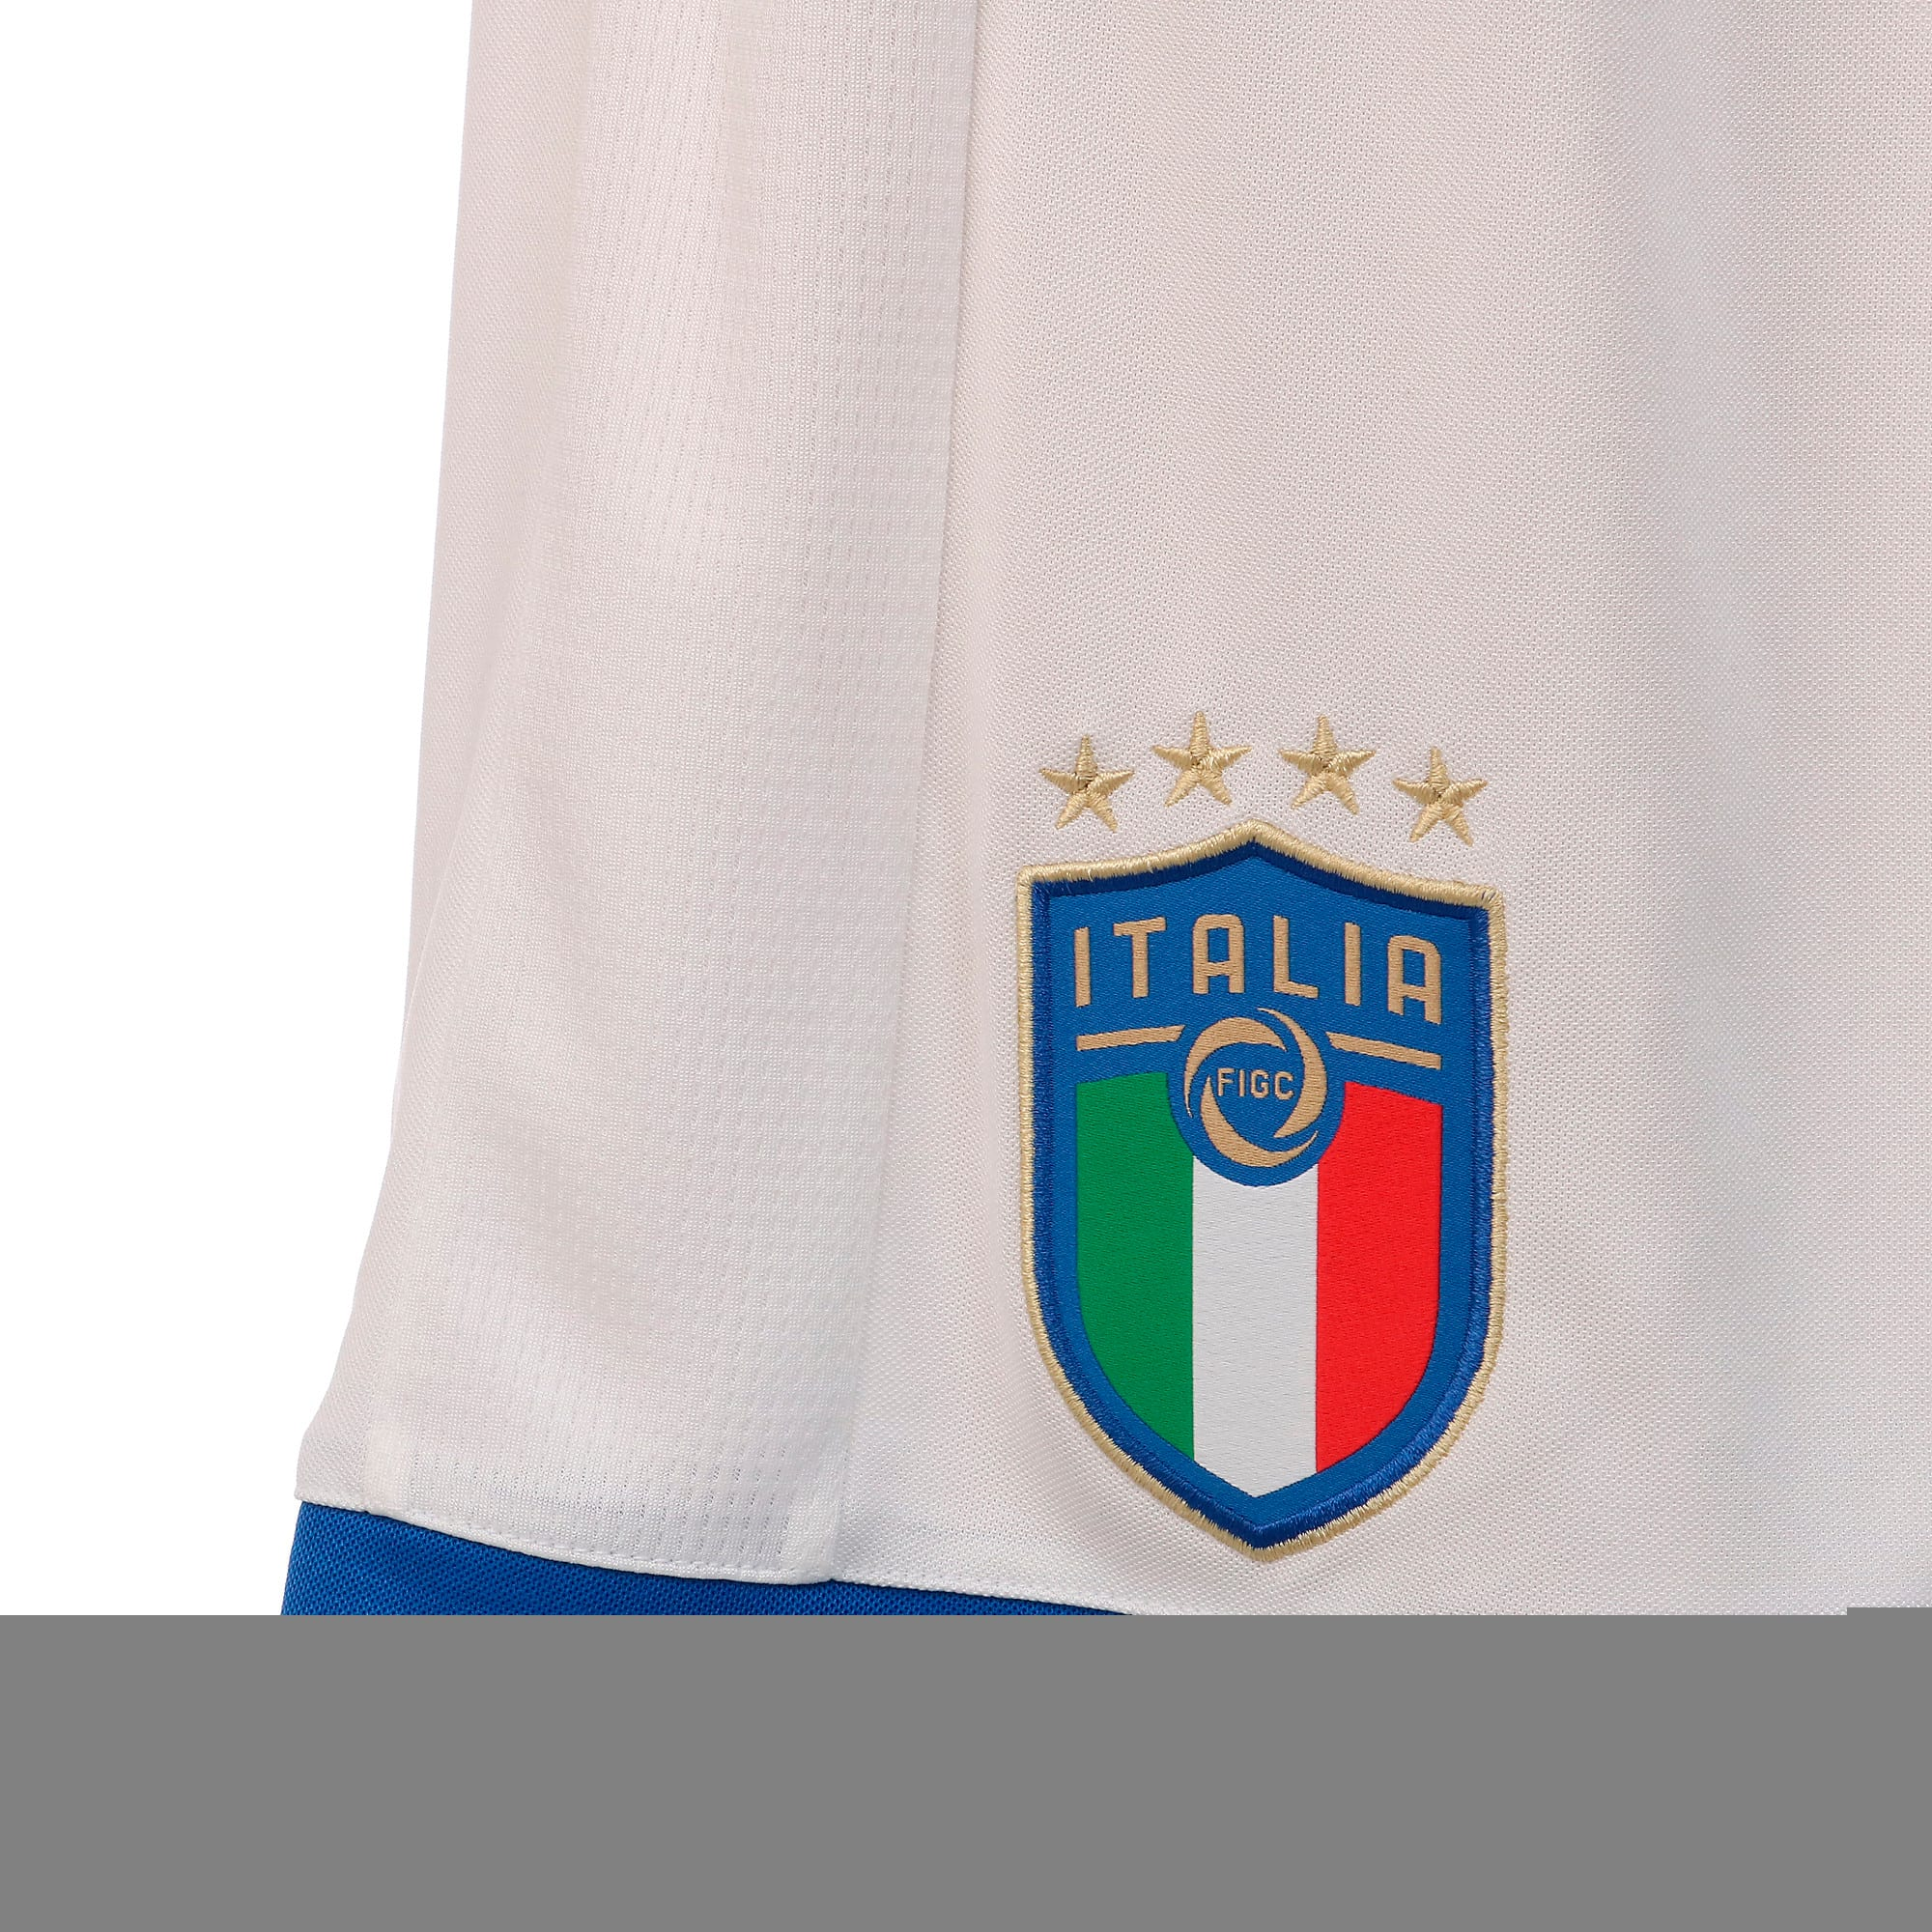 Thumbnail 7 of FIGC ITALIA ショーツ レプリカ, Puma White, medium-JPN